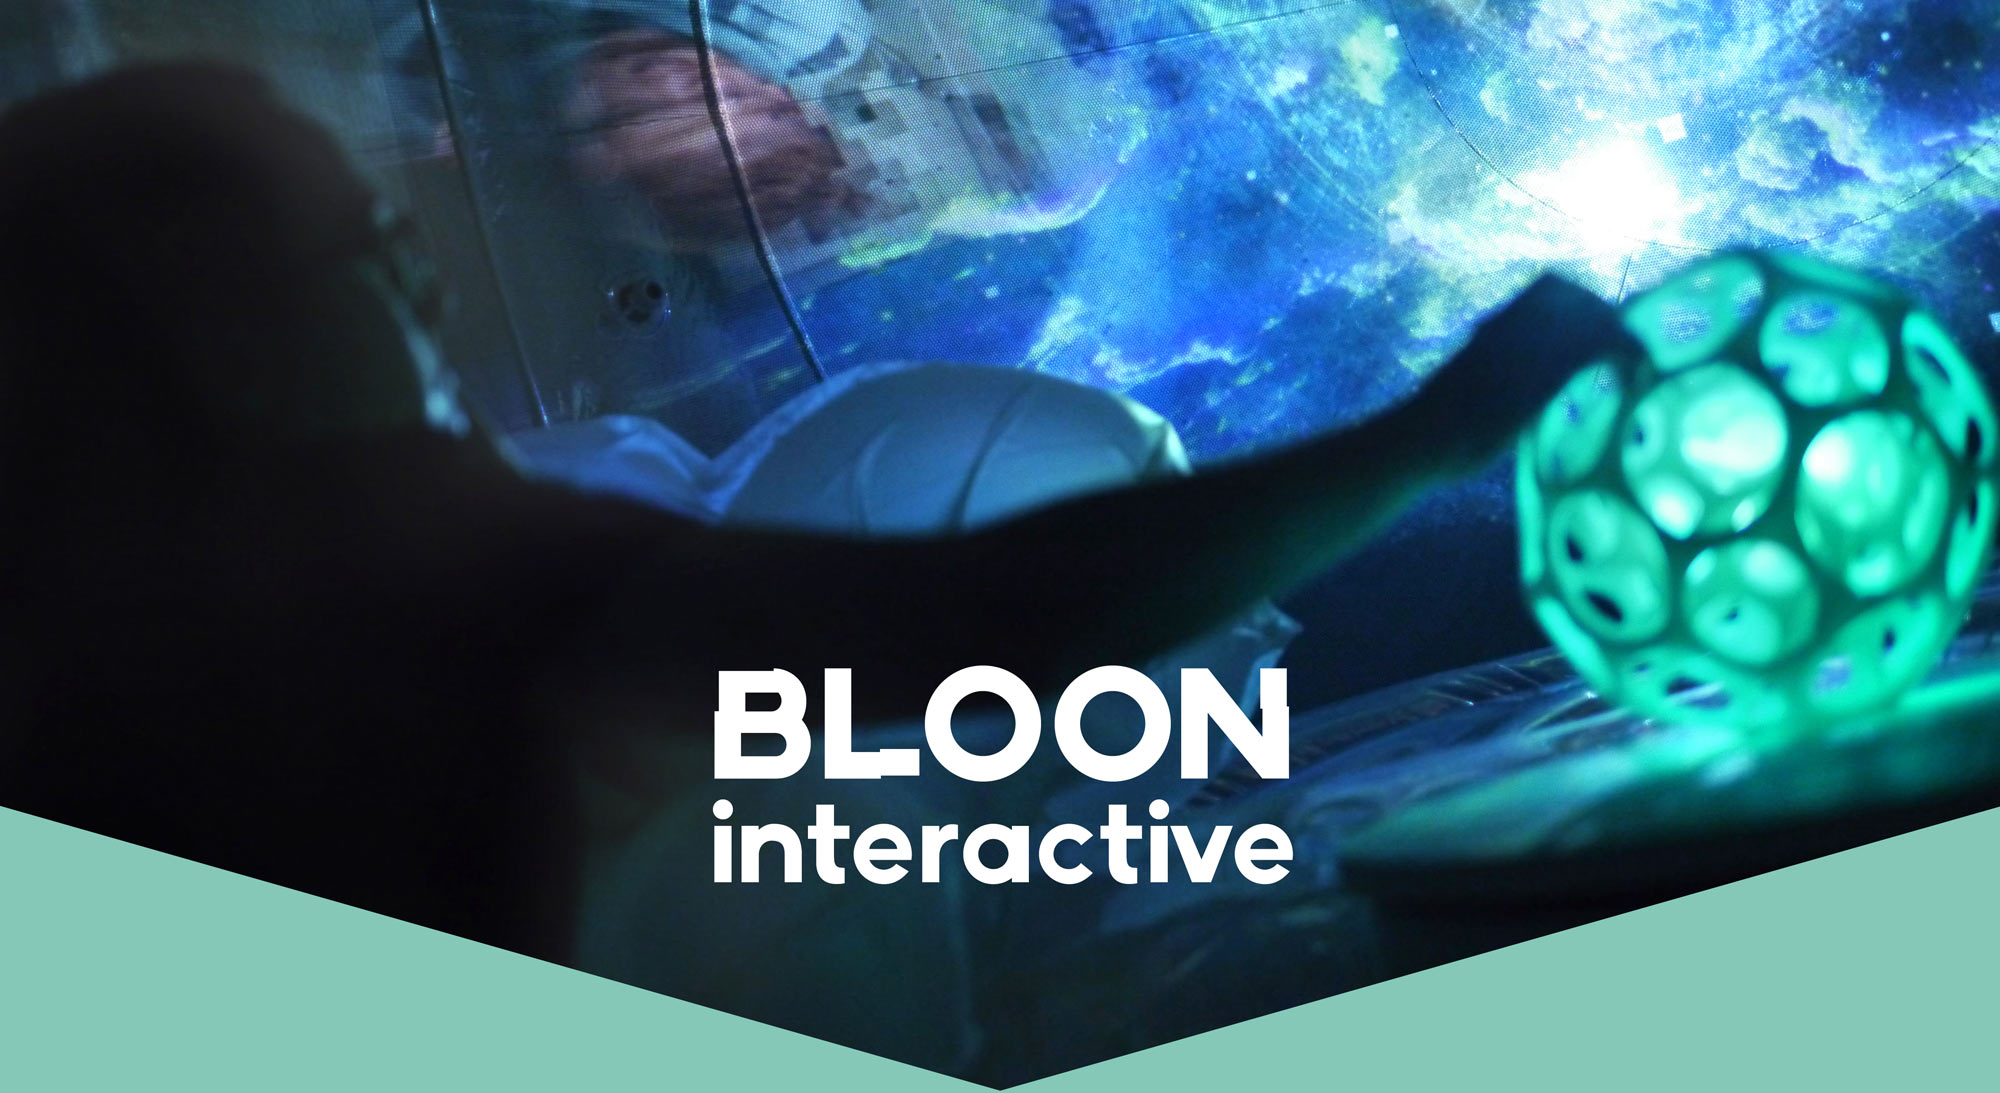 BLOON interactive